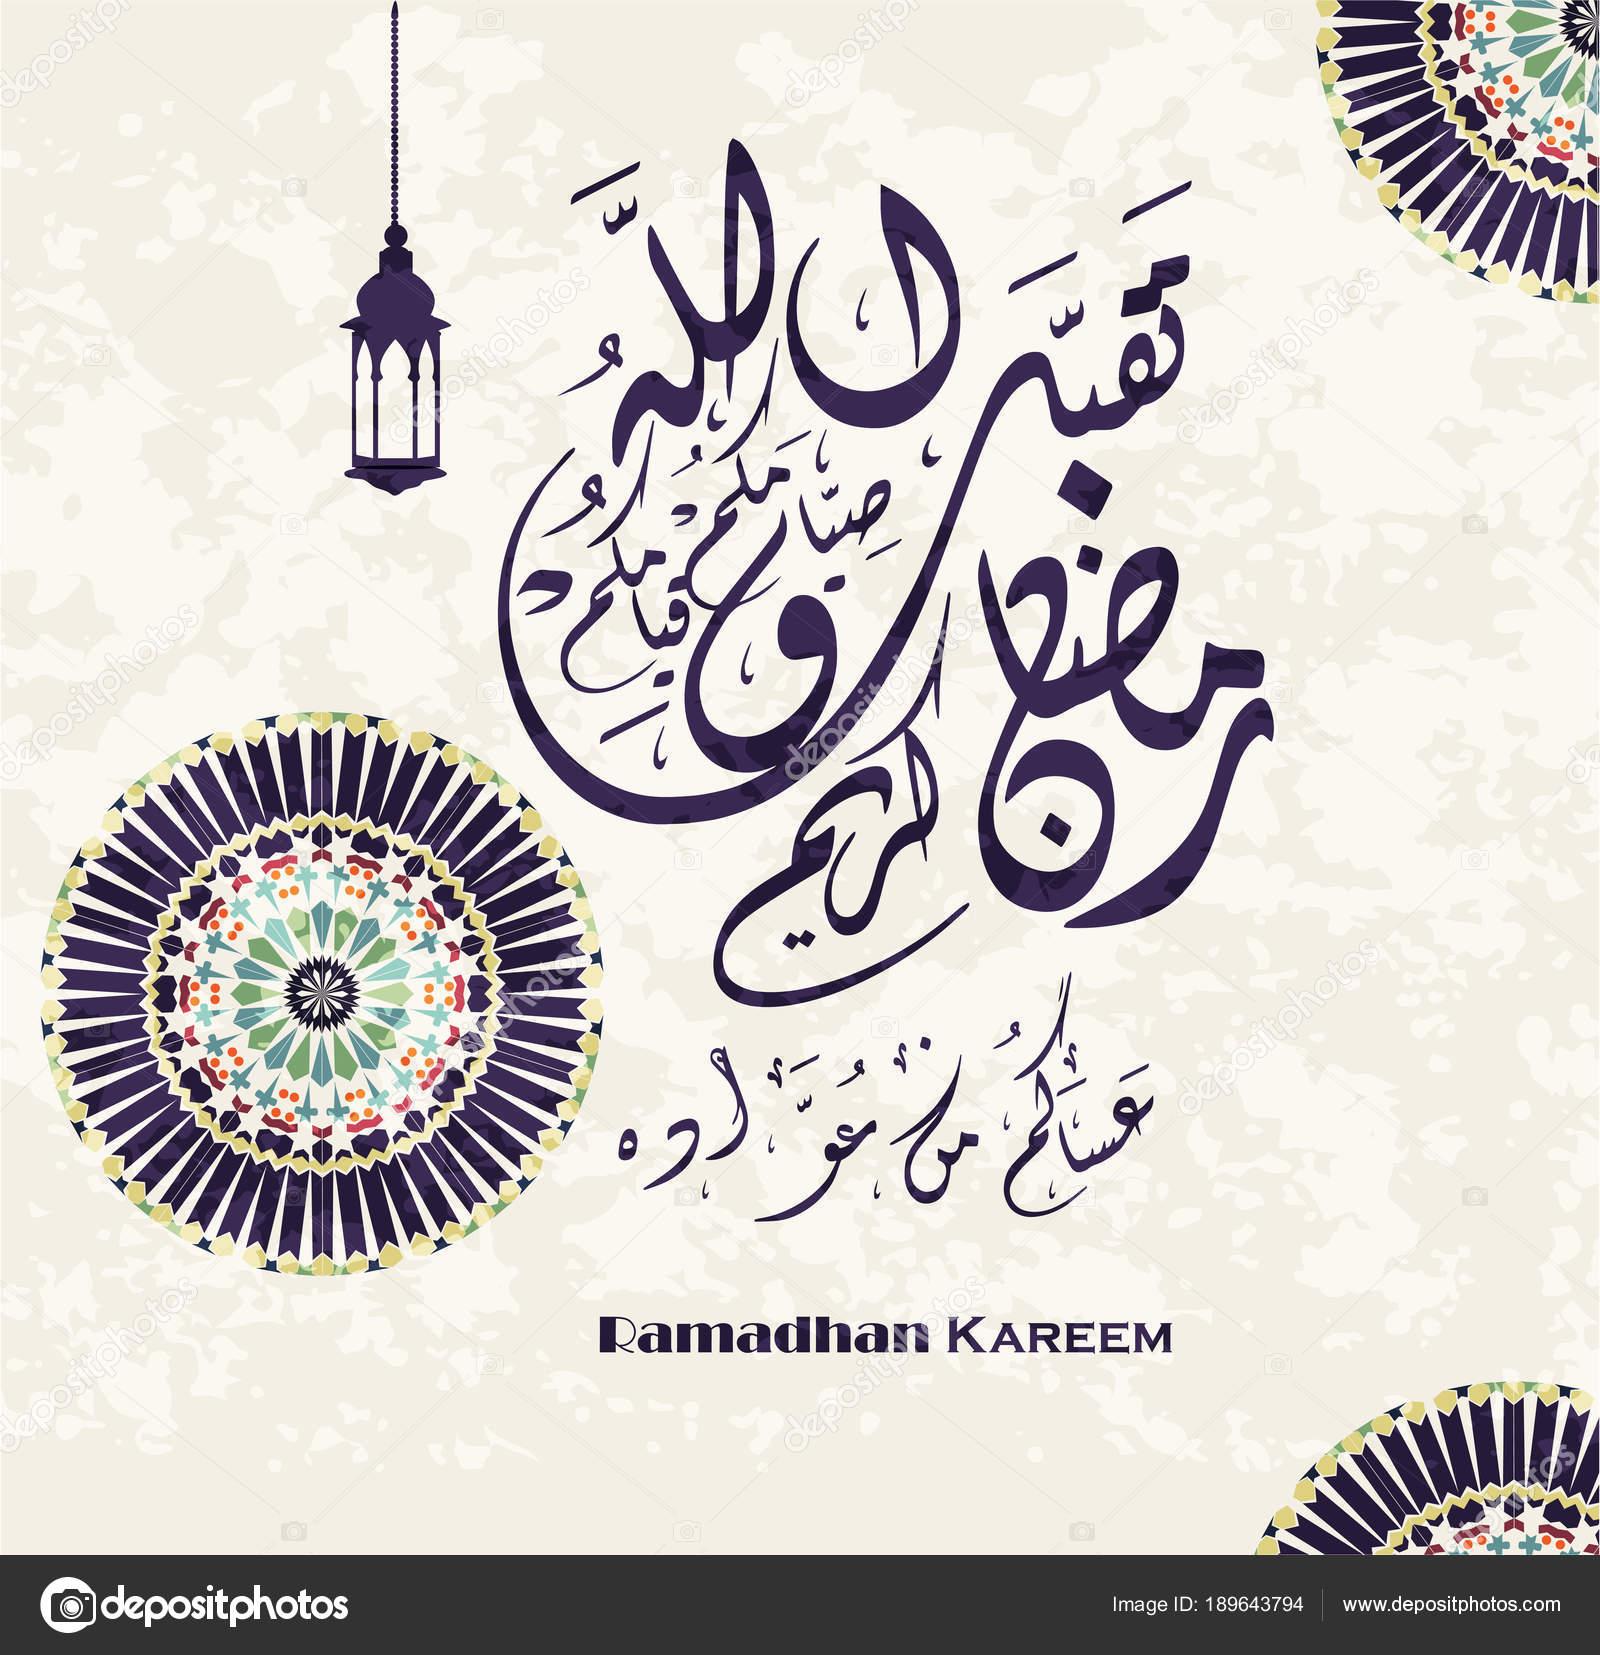 Ramadan kareem greeting card arabic calligraphy translation may ramadan kareem greeting card arabic calligraphy translation may allah accept stock vector m4hsunfo